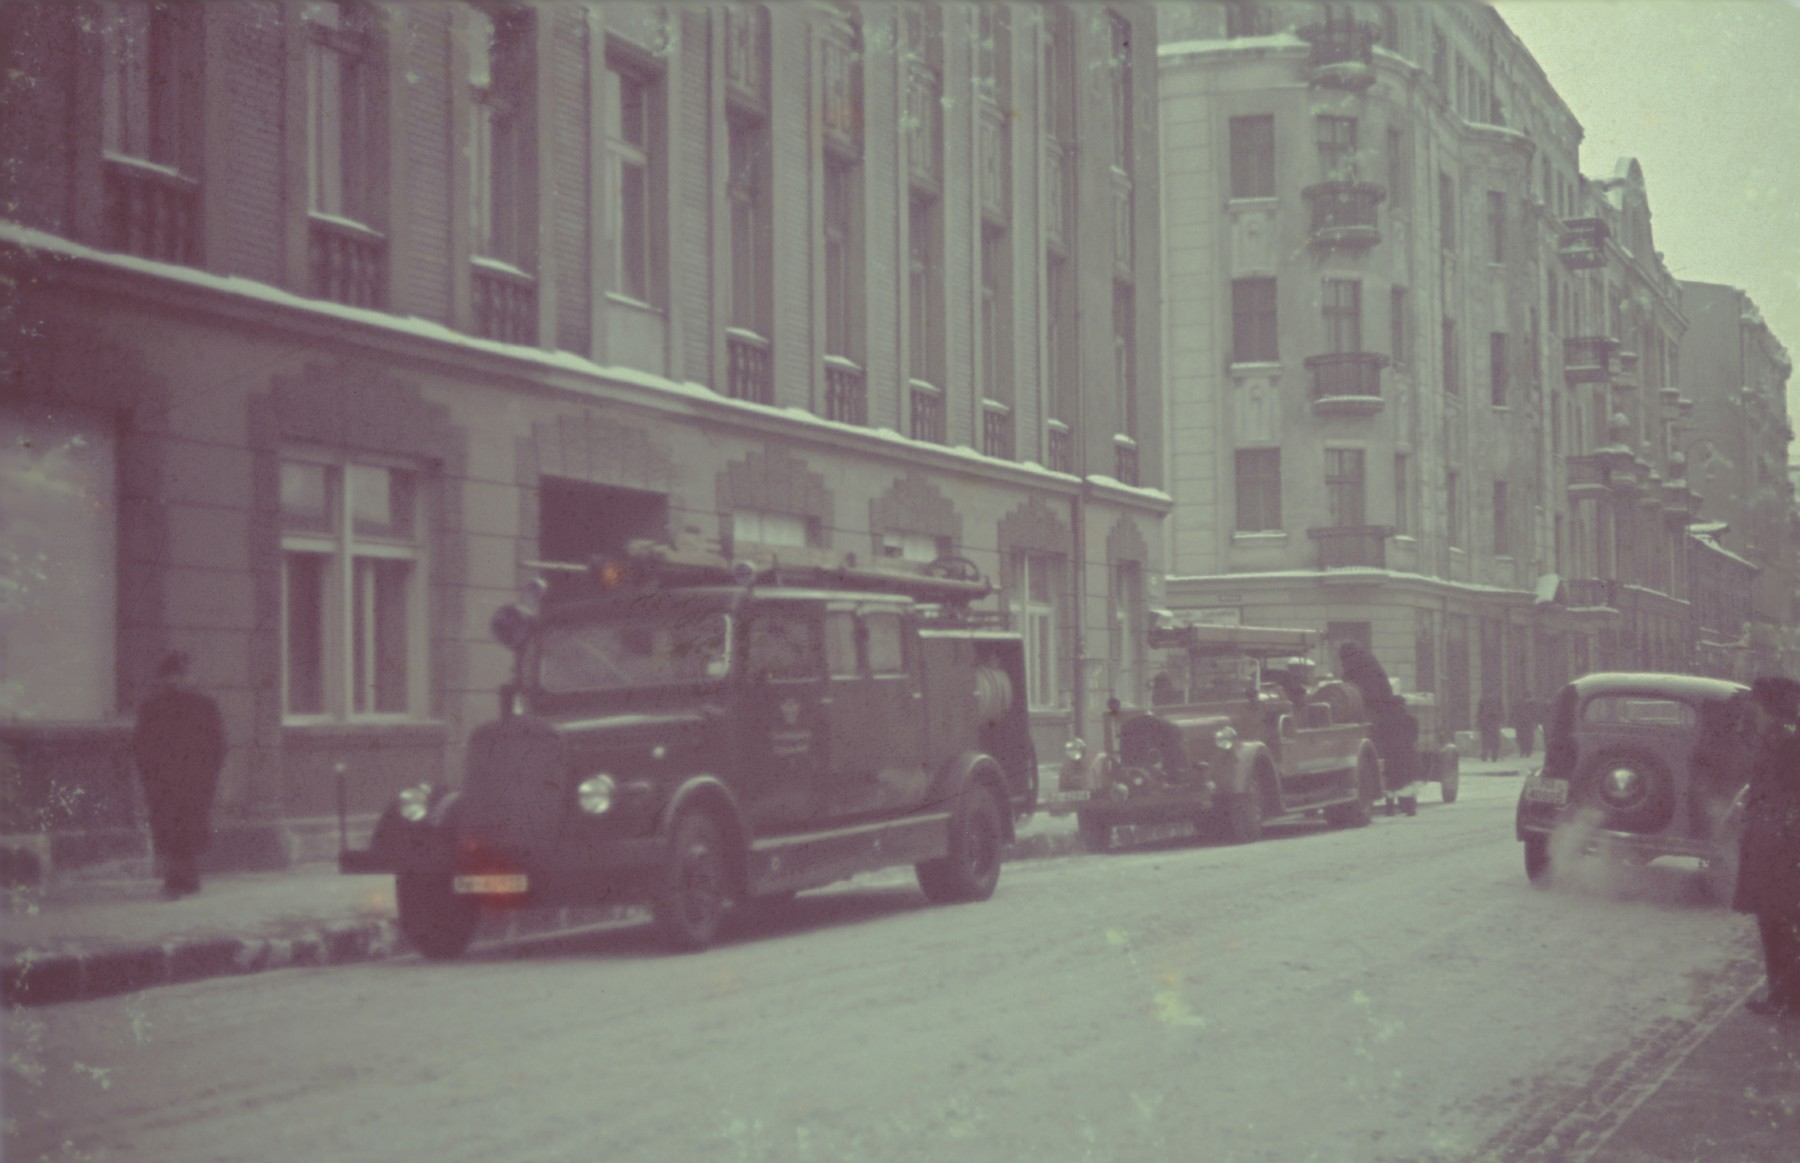 "Fire engines on a street of the Lodz ghetto.  Original German caption: ""?? in der Gettoverwaltung"", Winter 1941/1942"", #"